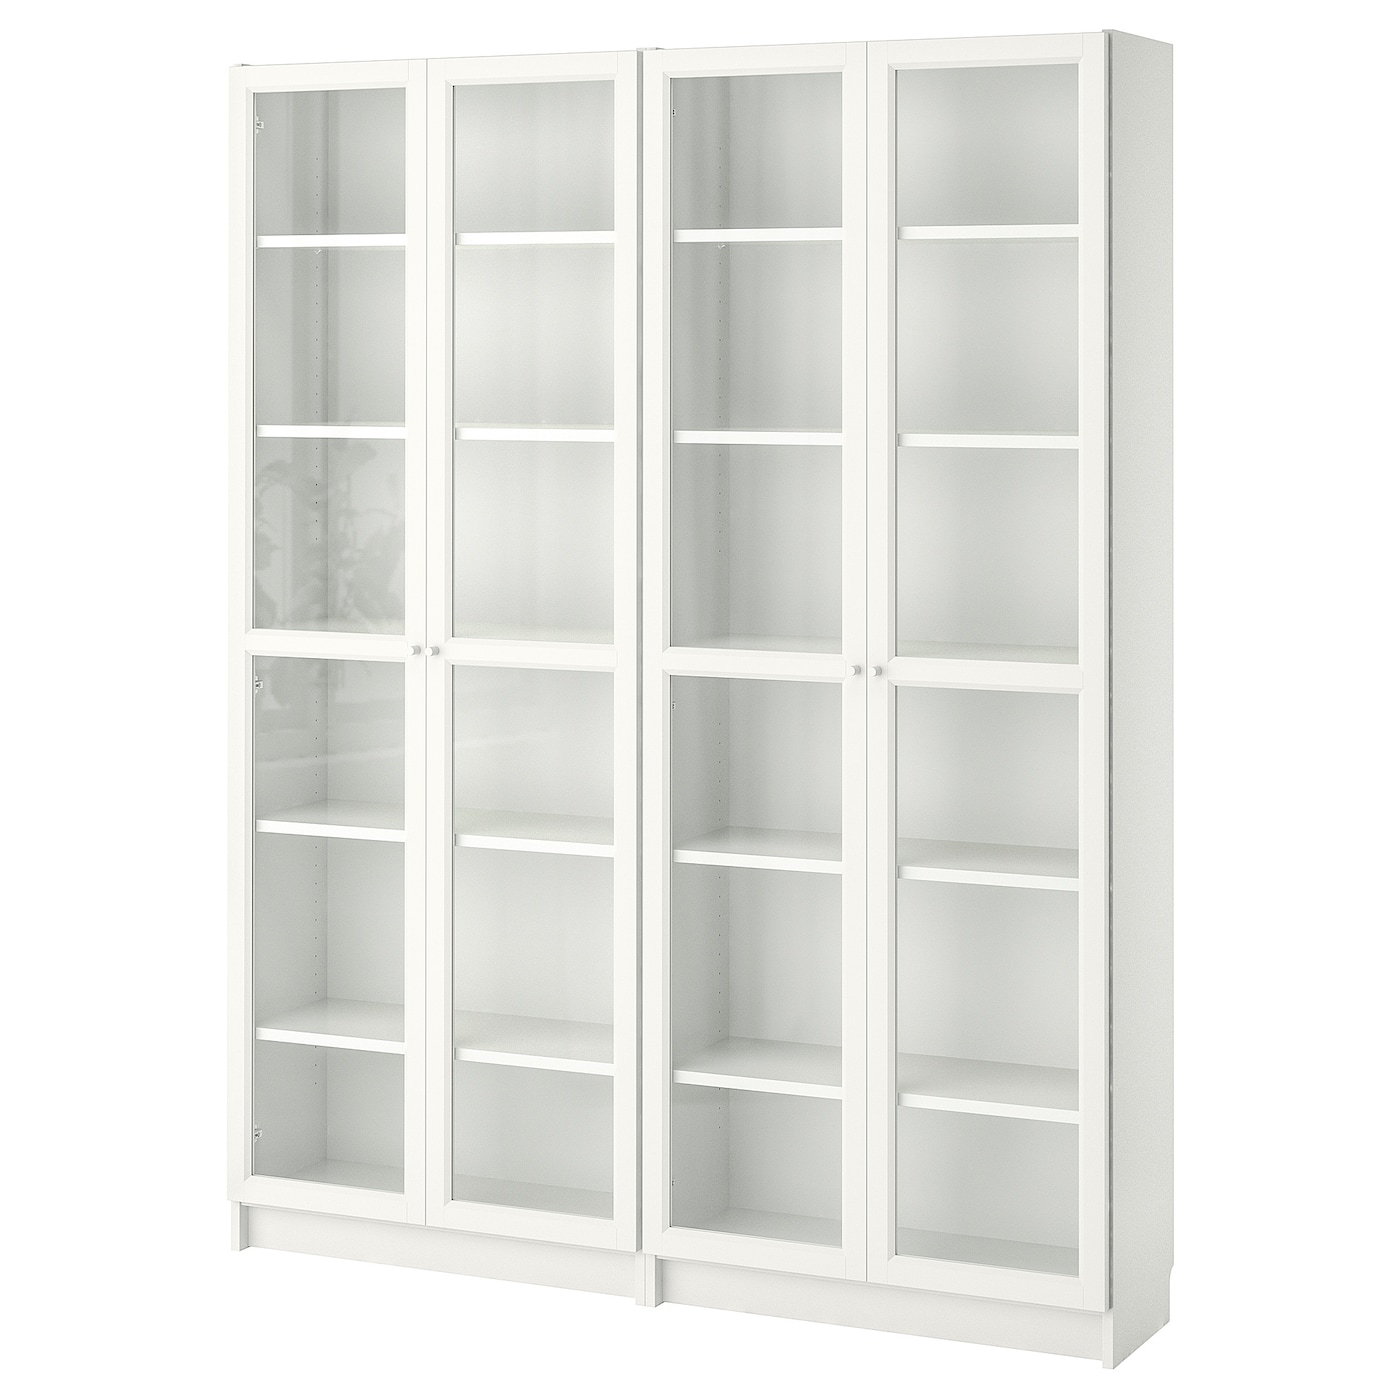 billy oxberg librer a blanco vidrio 160 x 30 x 202 cm ikea. Black Bedroom Furniture Sets. Home Design Ideas